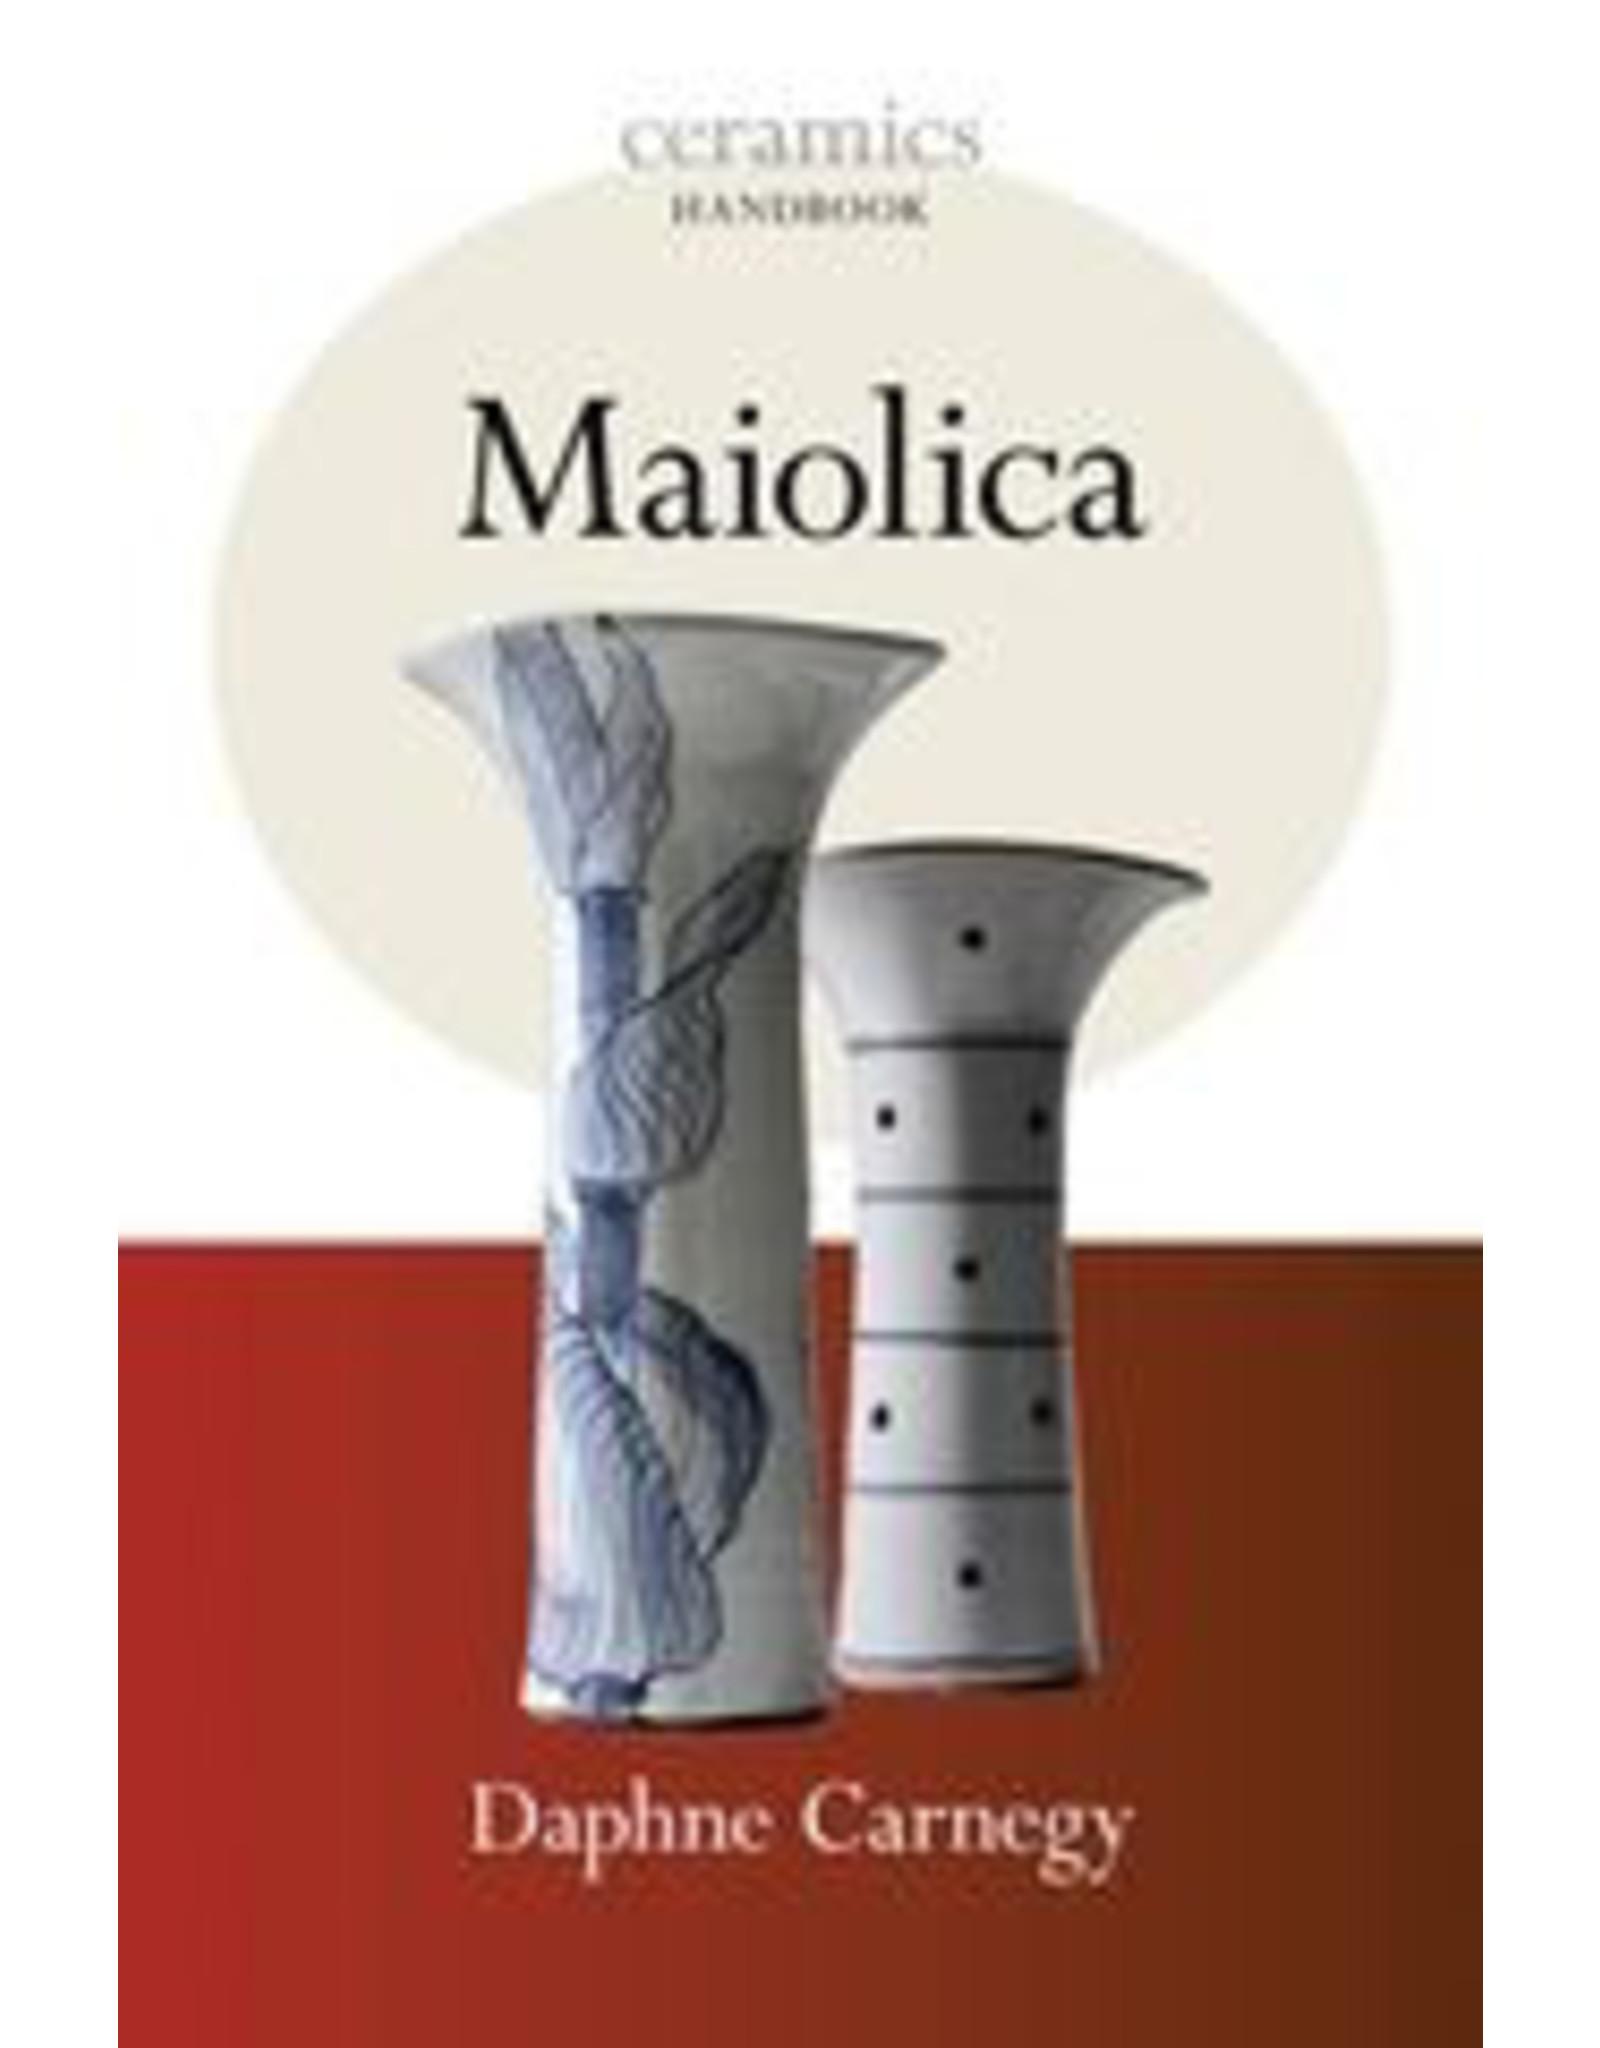 Maiolica: Daphne Carnegy